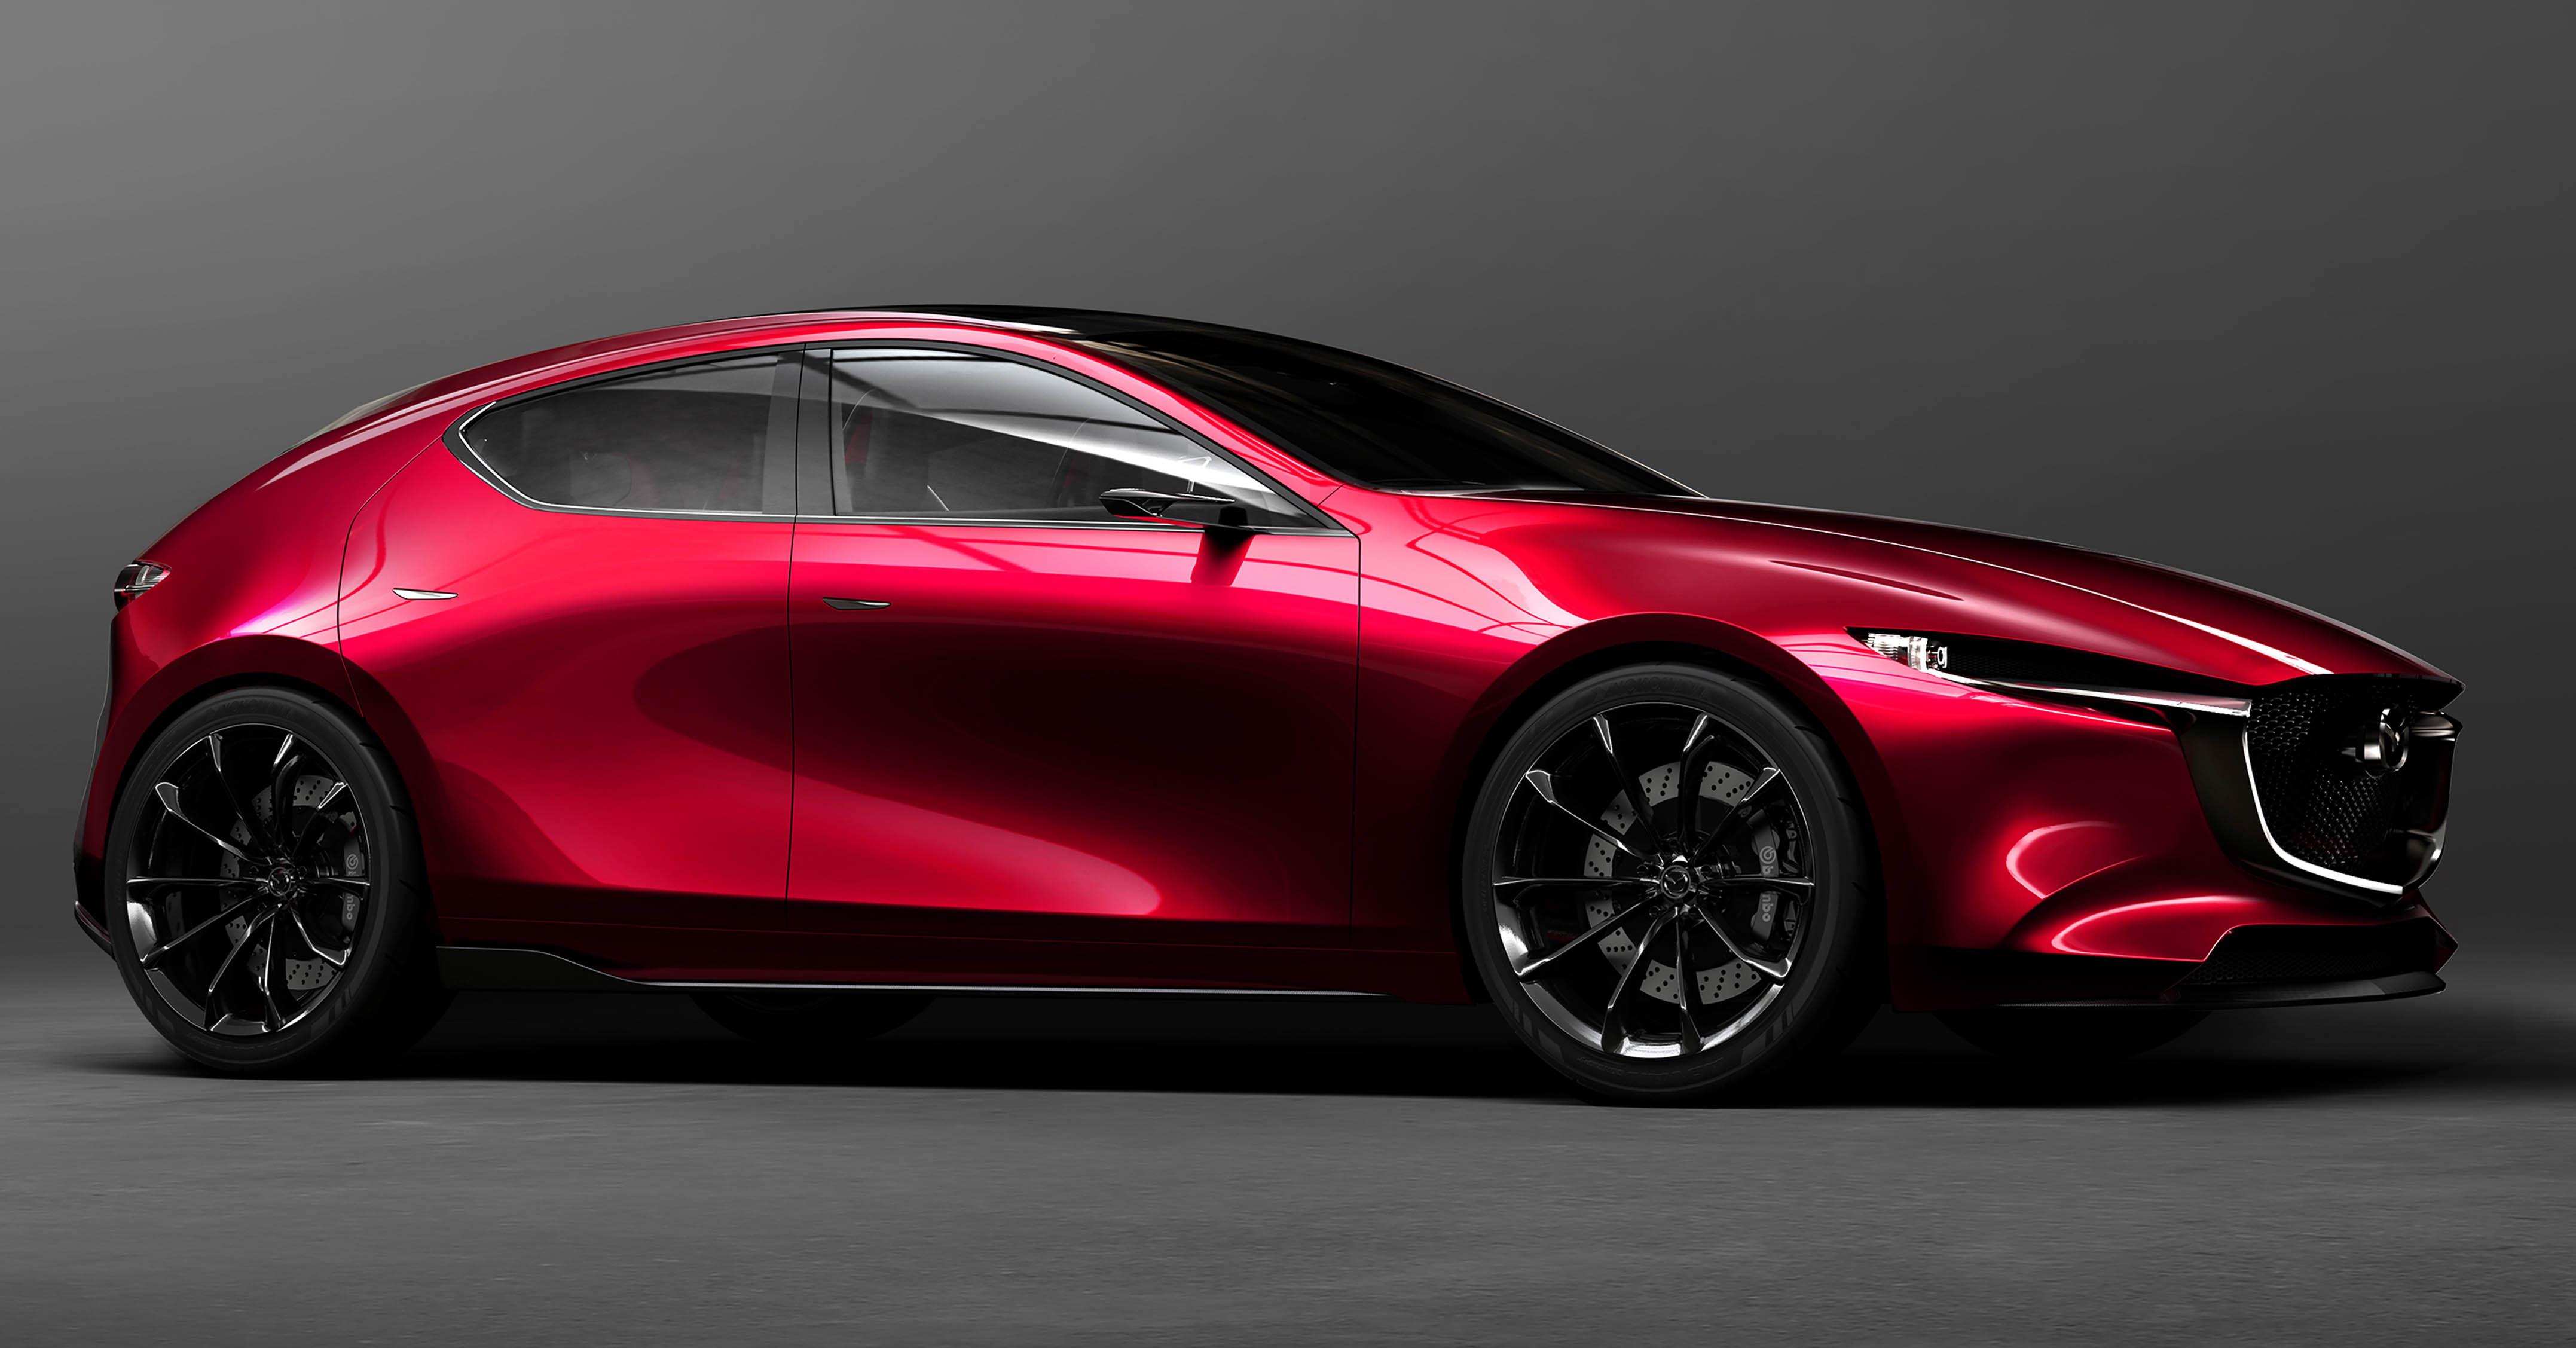 https://s2.paultan.org/image/2017/10/Mazda-Kai-Concept-2.jpg